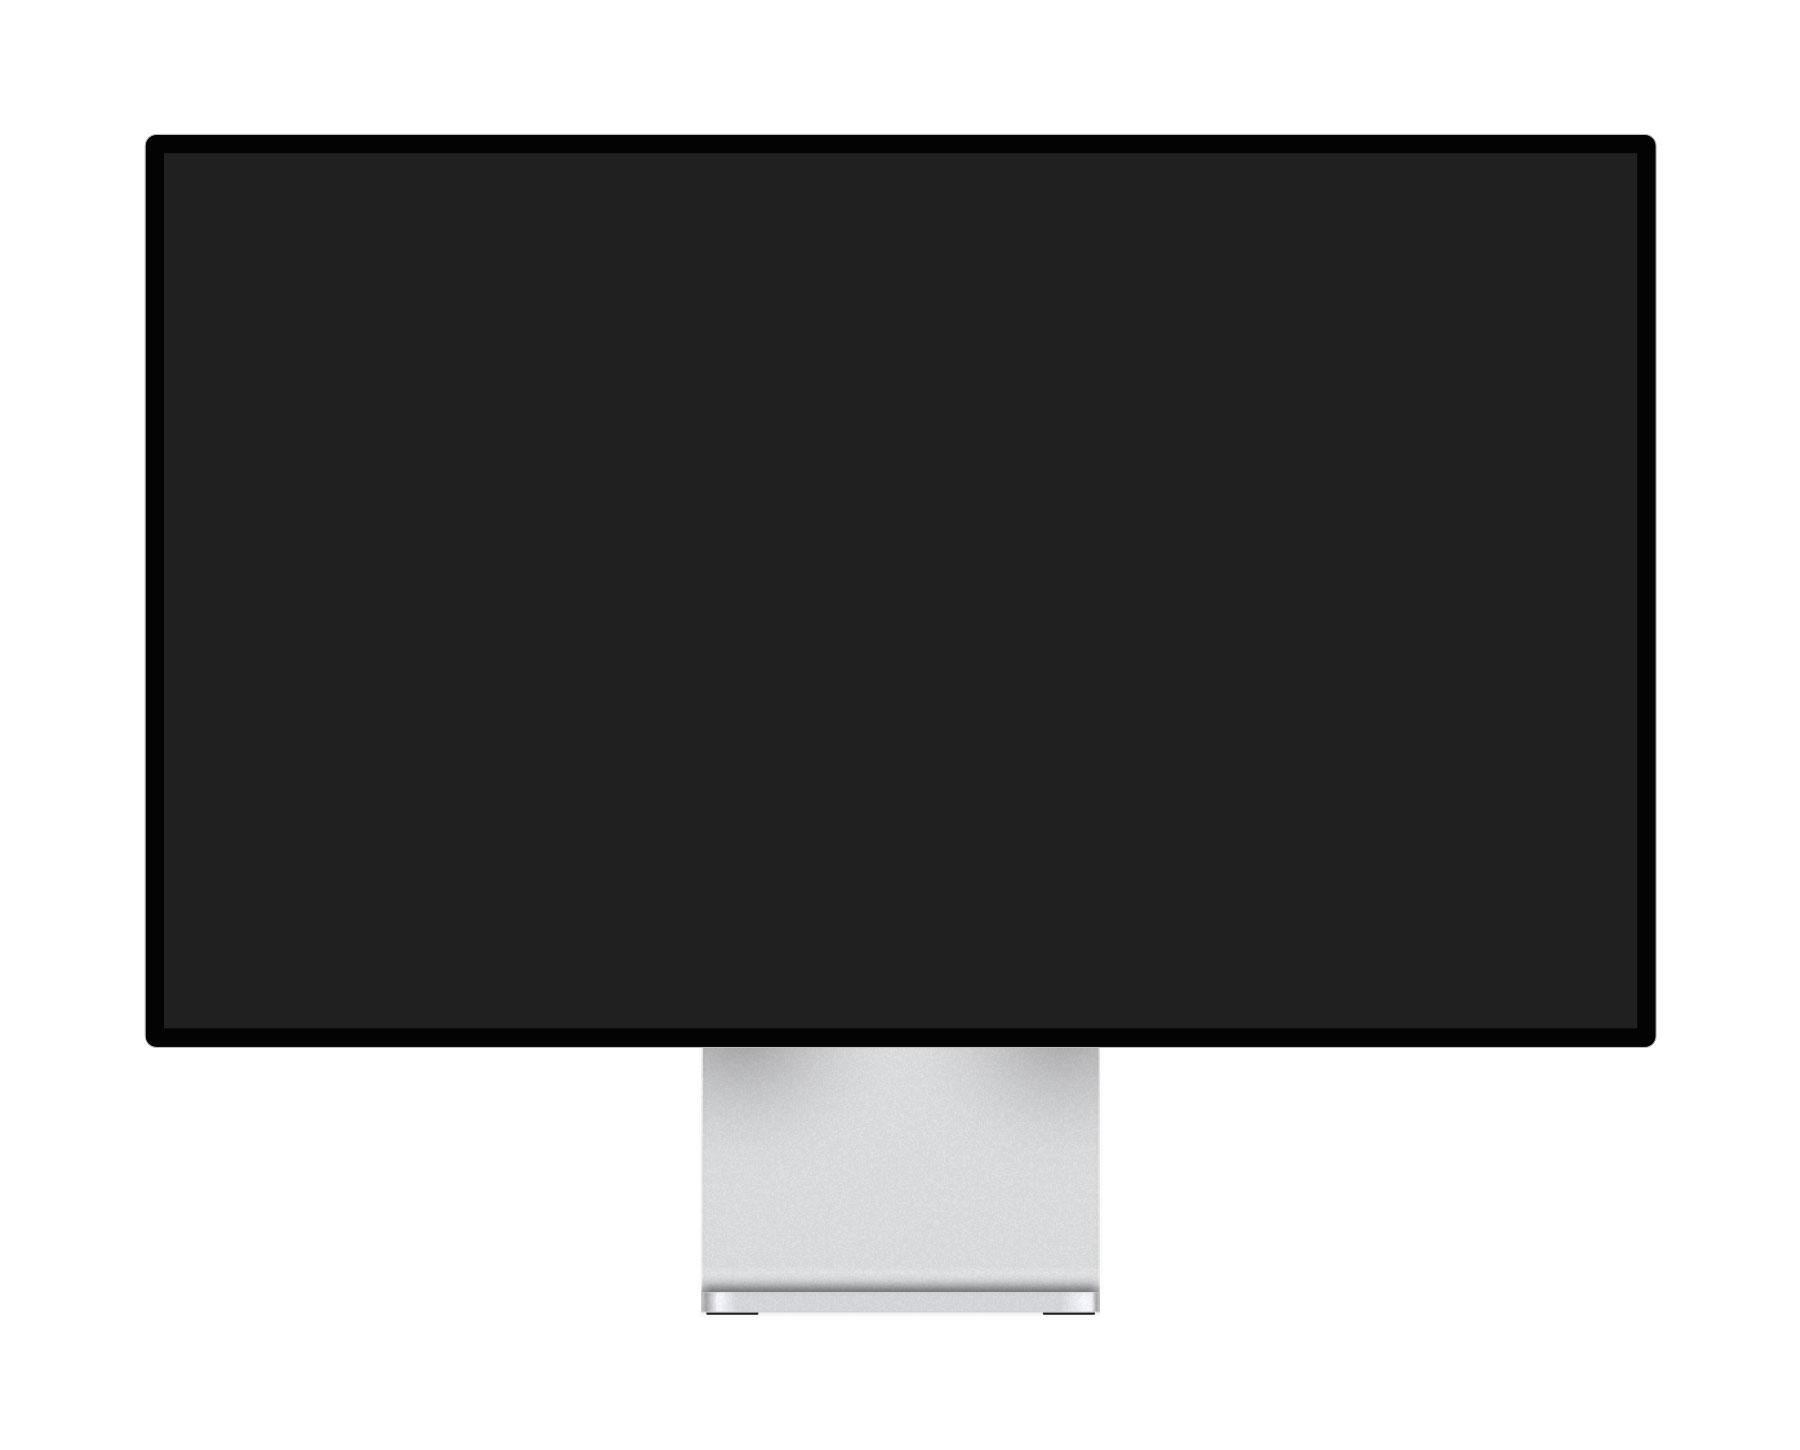 Apple Pro Display XDR 样机素材.sketch素材下载 样机素材-第1张